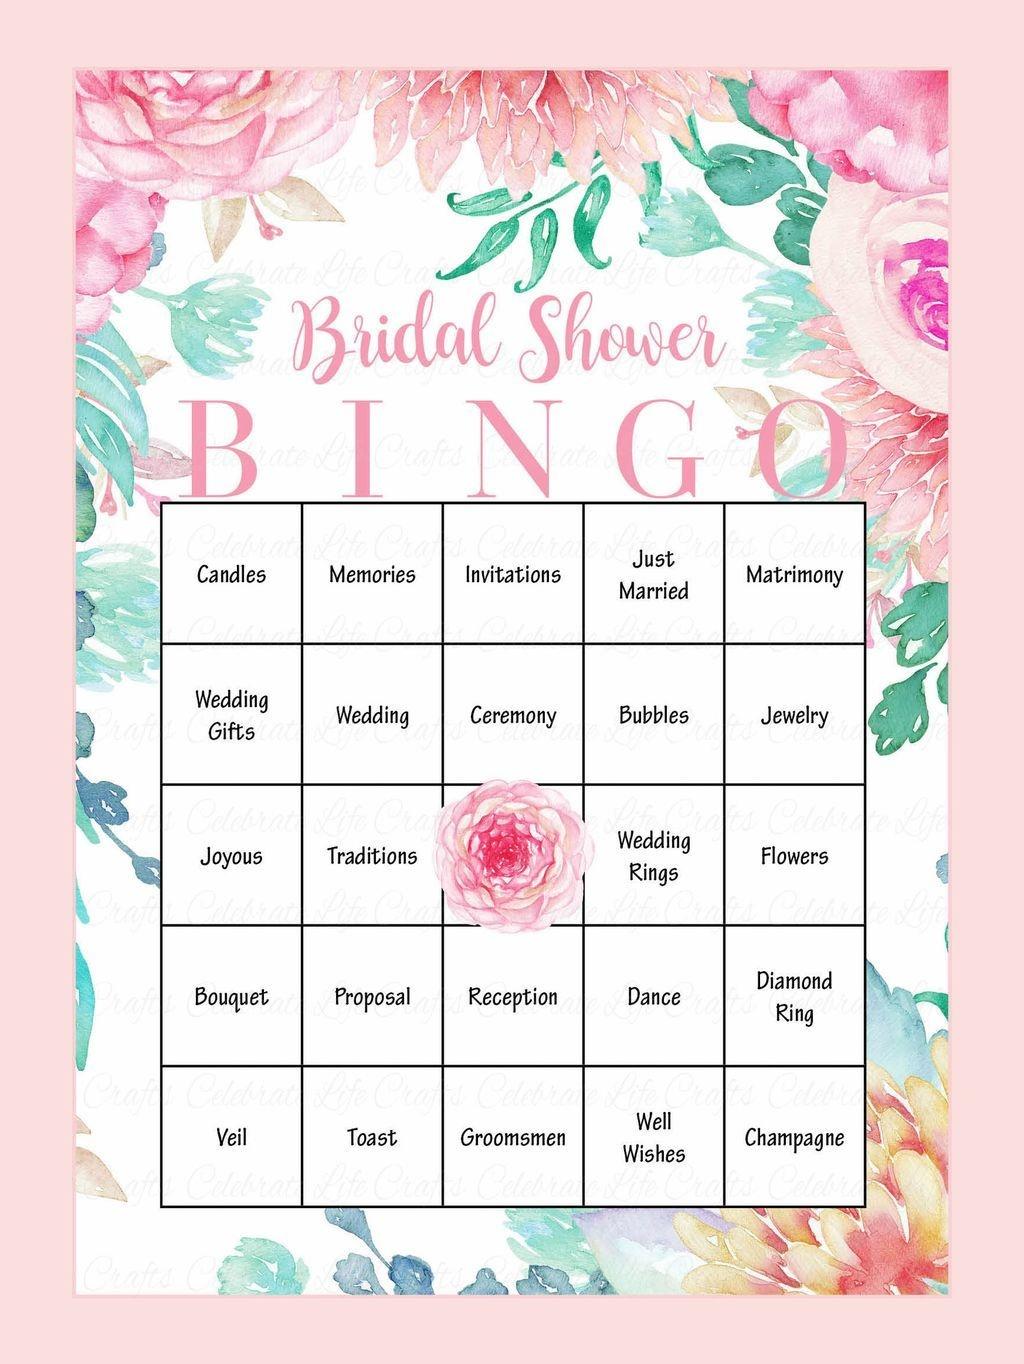 10 Printable Bridal Shower Games You Can Diy | Wedding Ideas - Free Printable Bridal Bingo Sheets